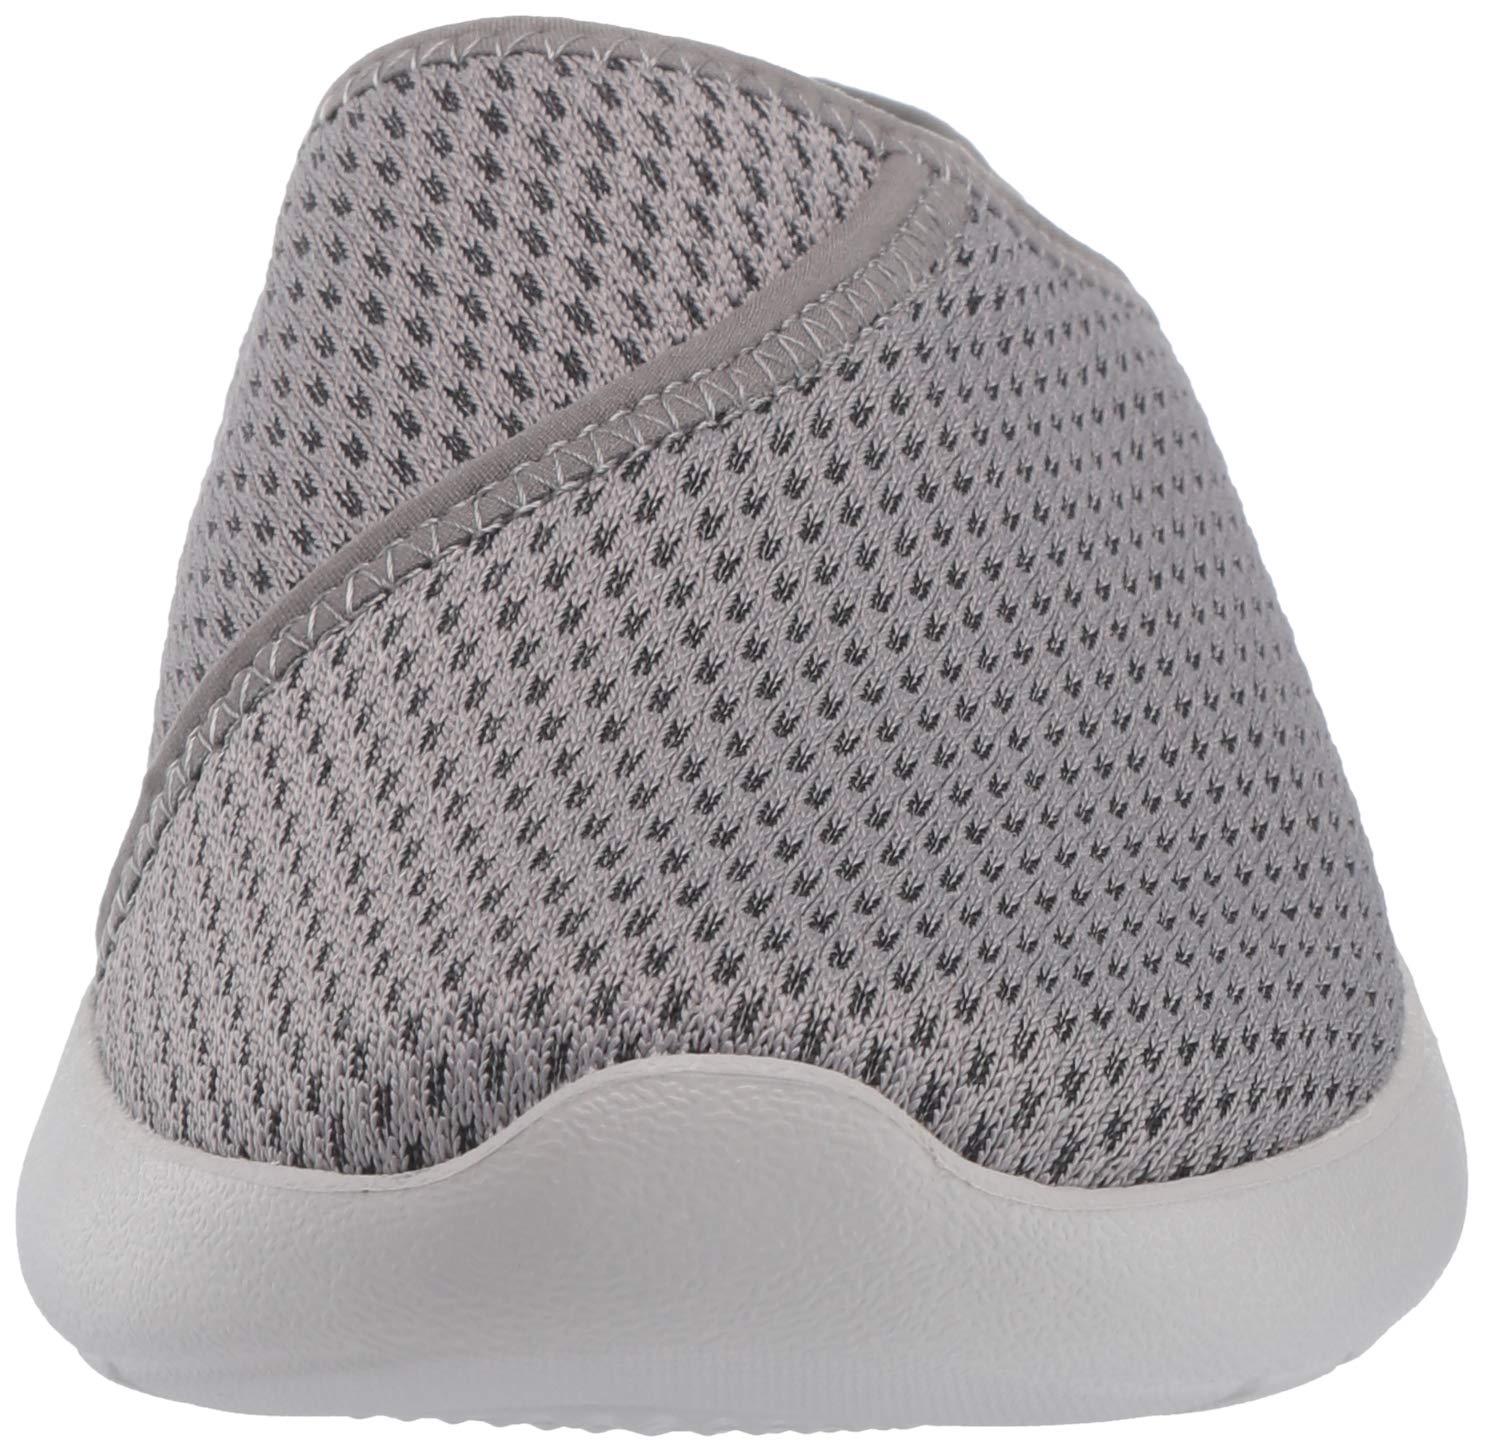 Crocs Women's LiteRide Mesh Mule Sneaker